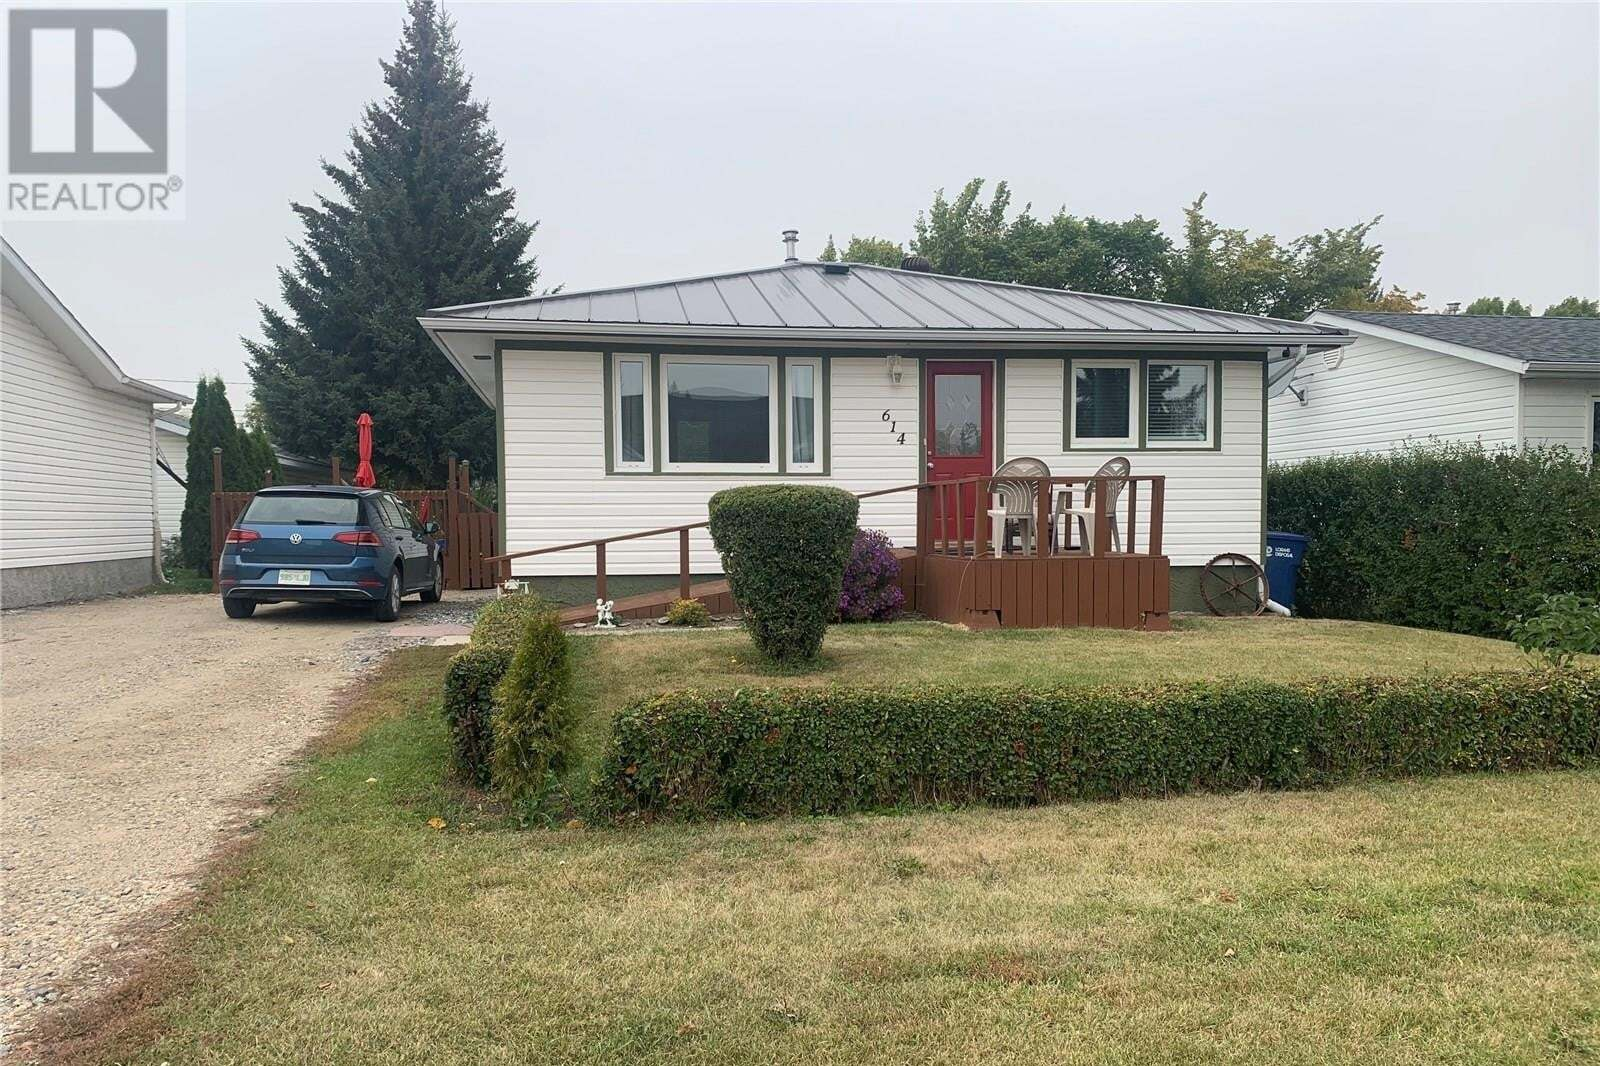 House for sale at 614 Ogilvie St Moosomin Saskatchewan - MLS: SK826955